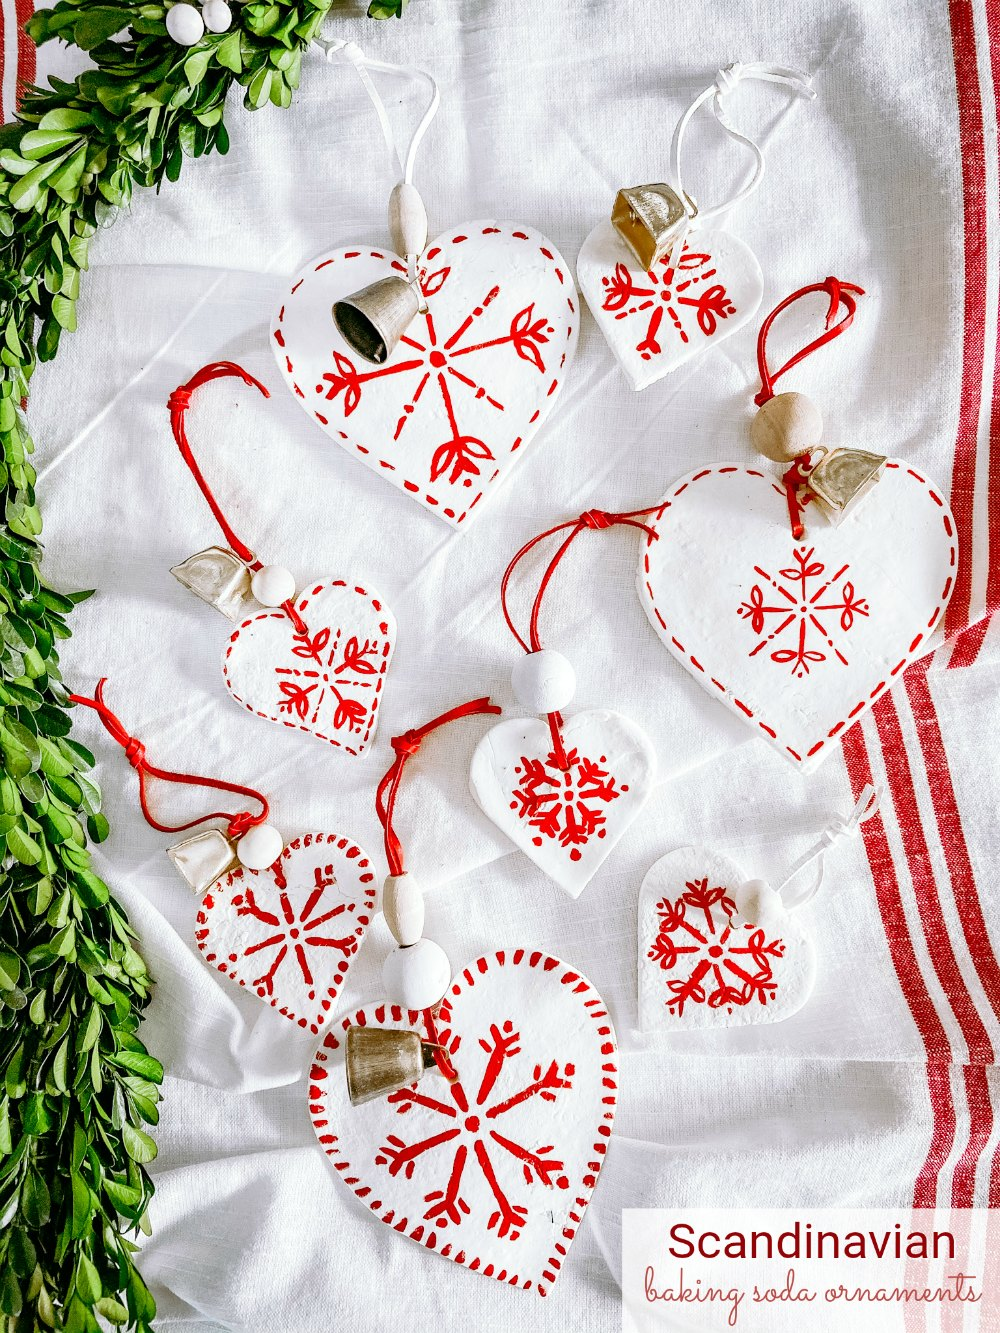 Scandinavian Baking Soda Ornaments